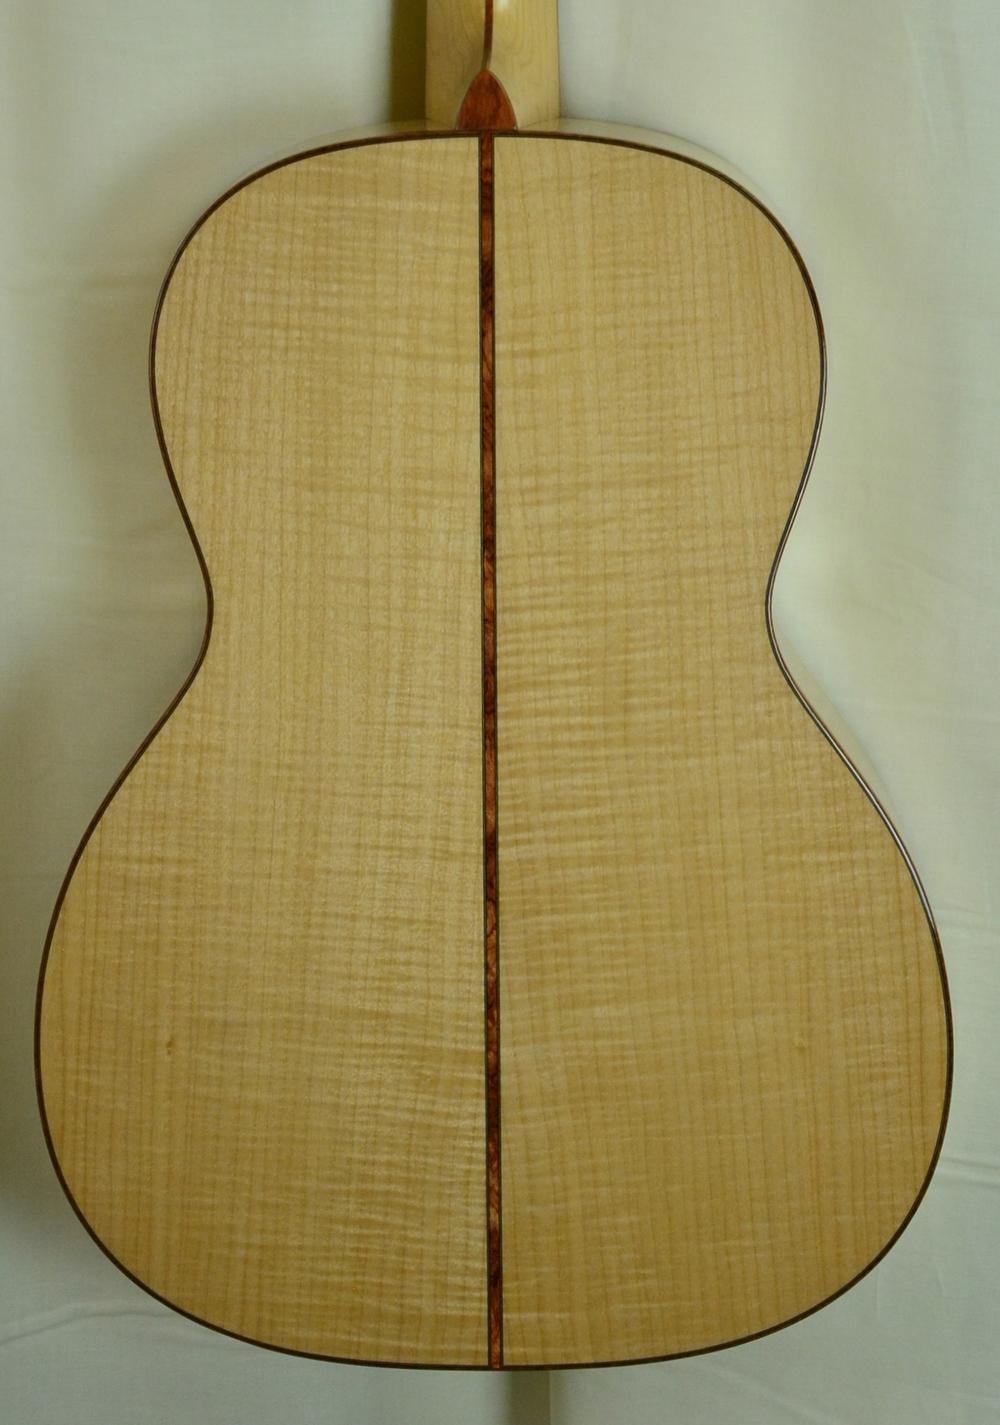 Q-2658124 S-1938295 00028VS Pacific Big Leaf Maple AAAA, Maple neck Bubinga binding (4).JPG